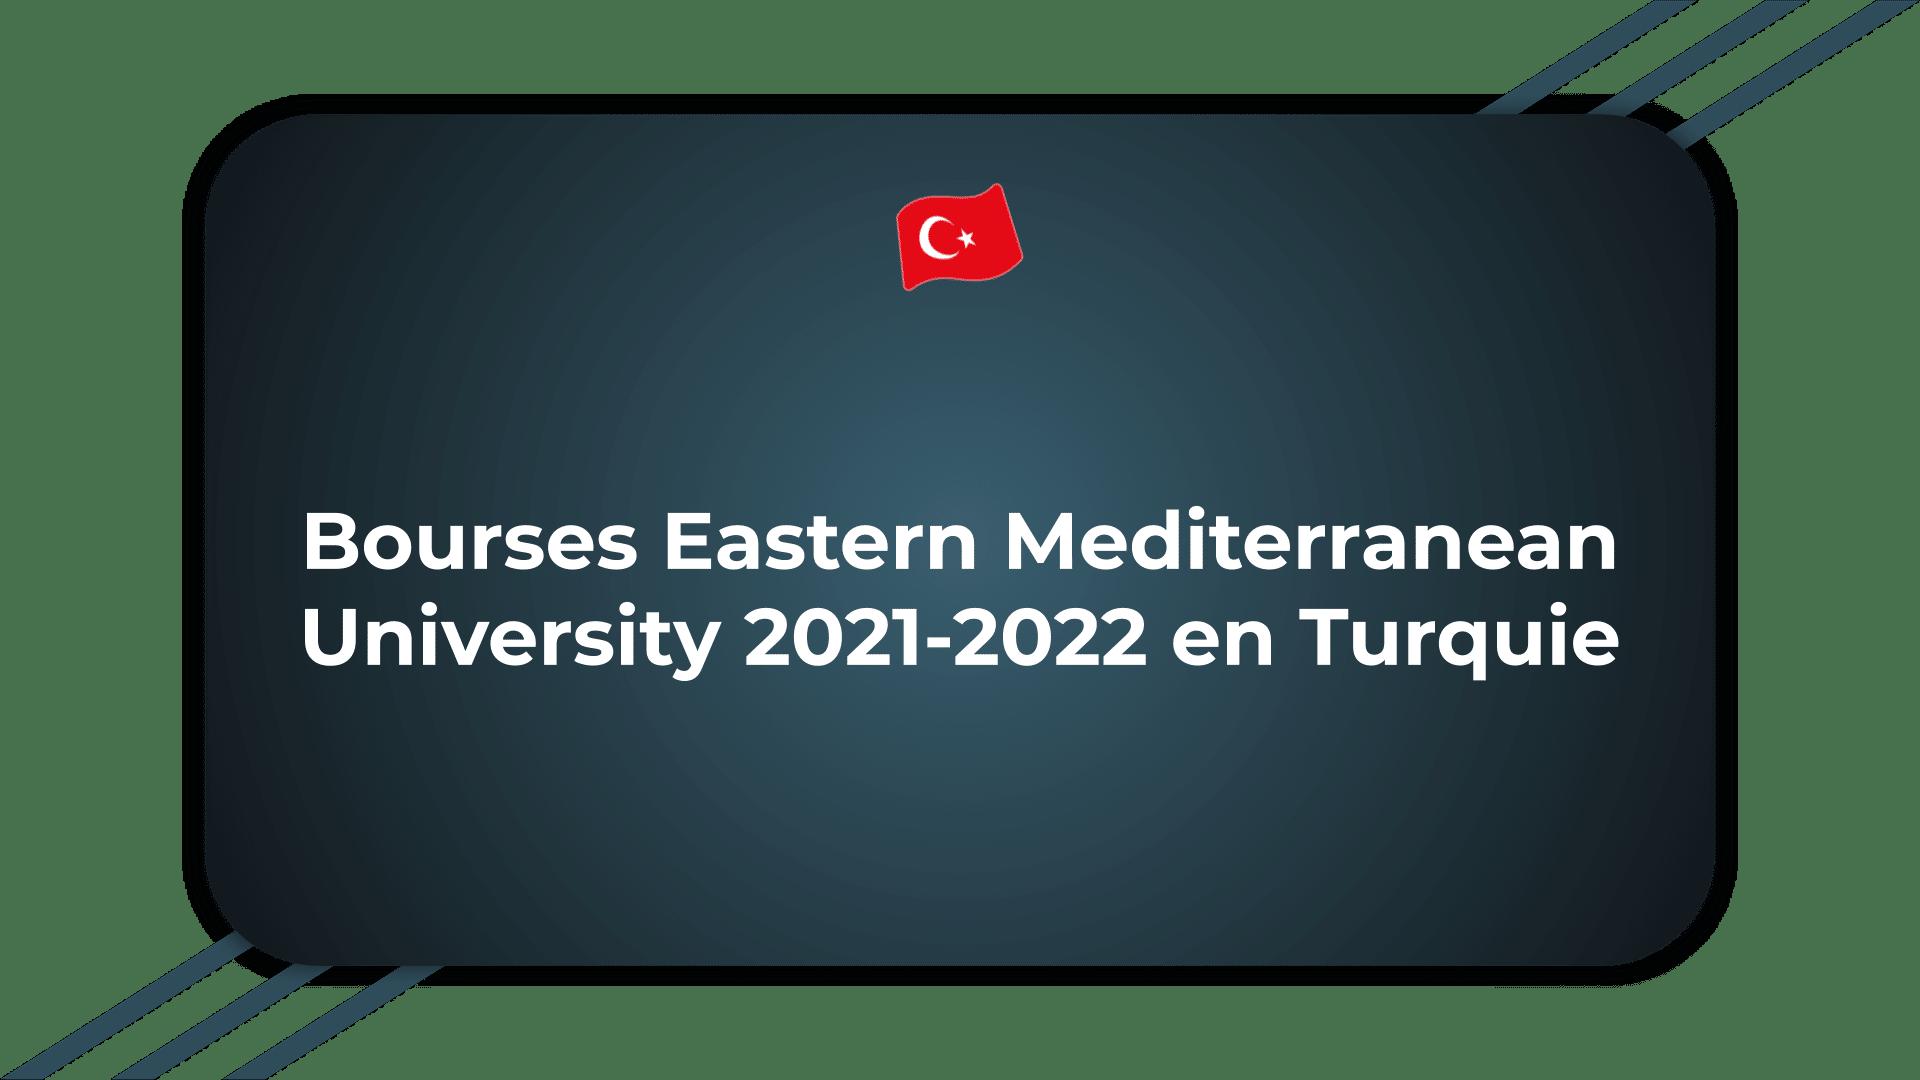 Bourses Eastern Mediterranean University